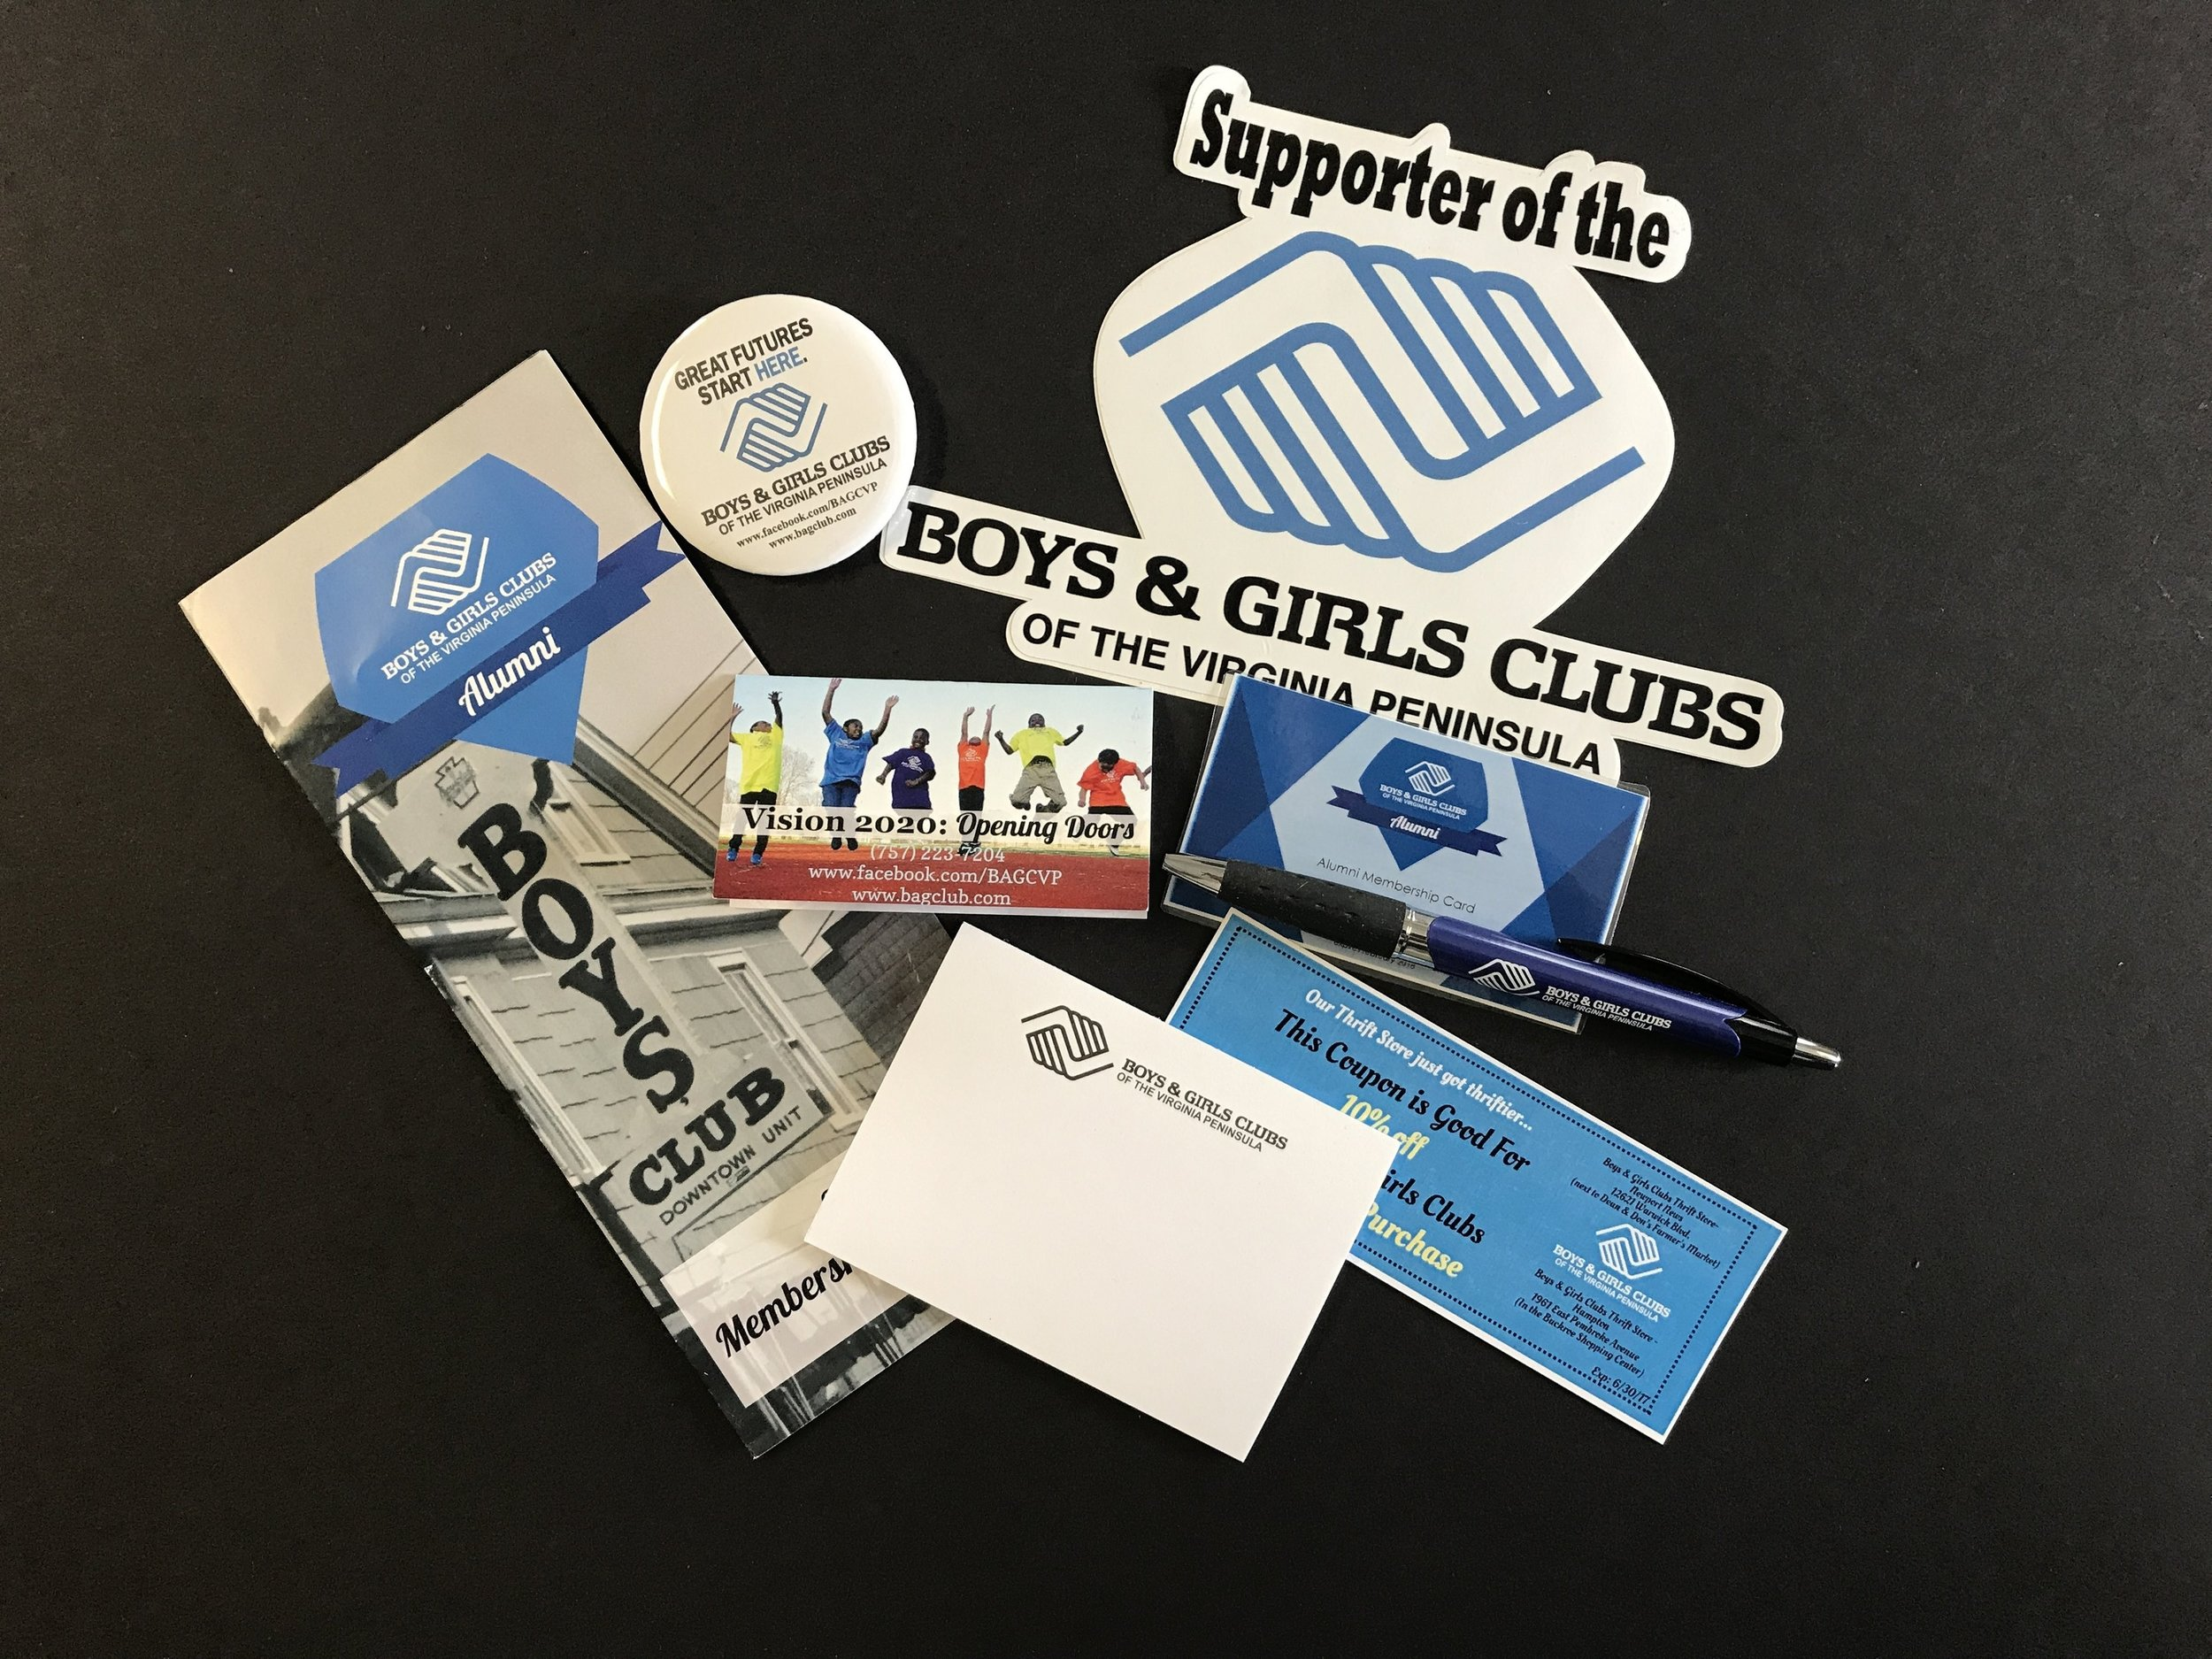 Boys & Girls Club - brochure x stickers x membership card x flyer x poster x logo x postcard x program x placemat x tshirt x website